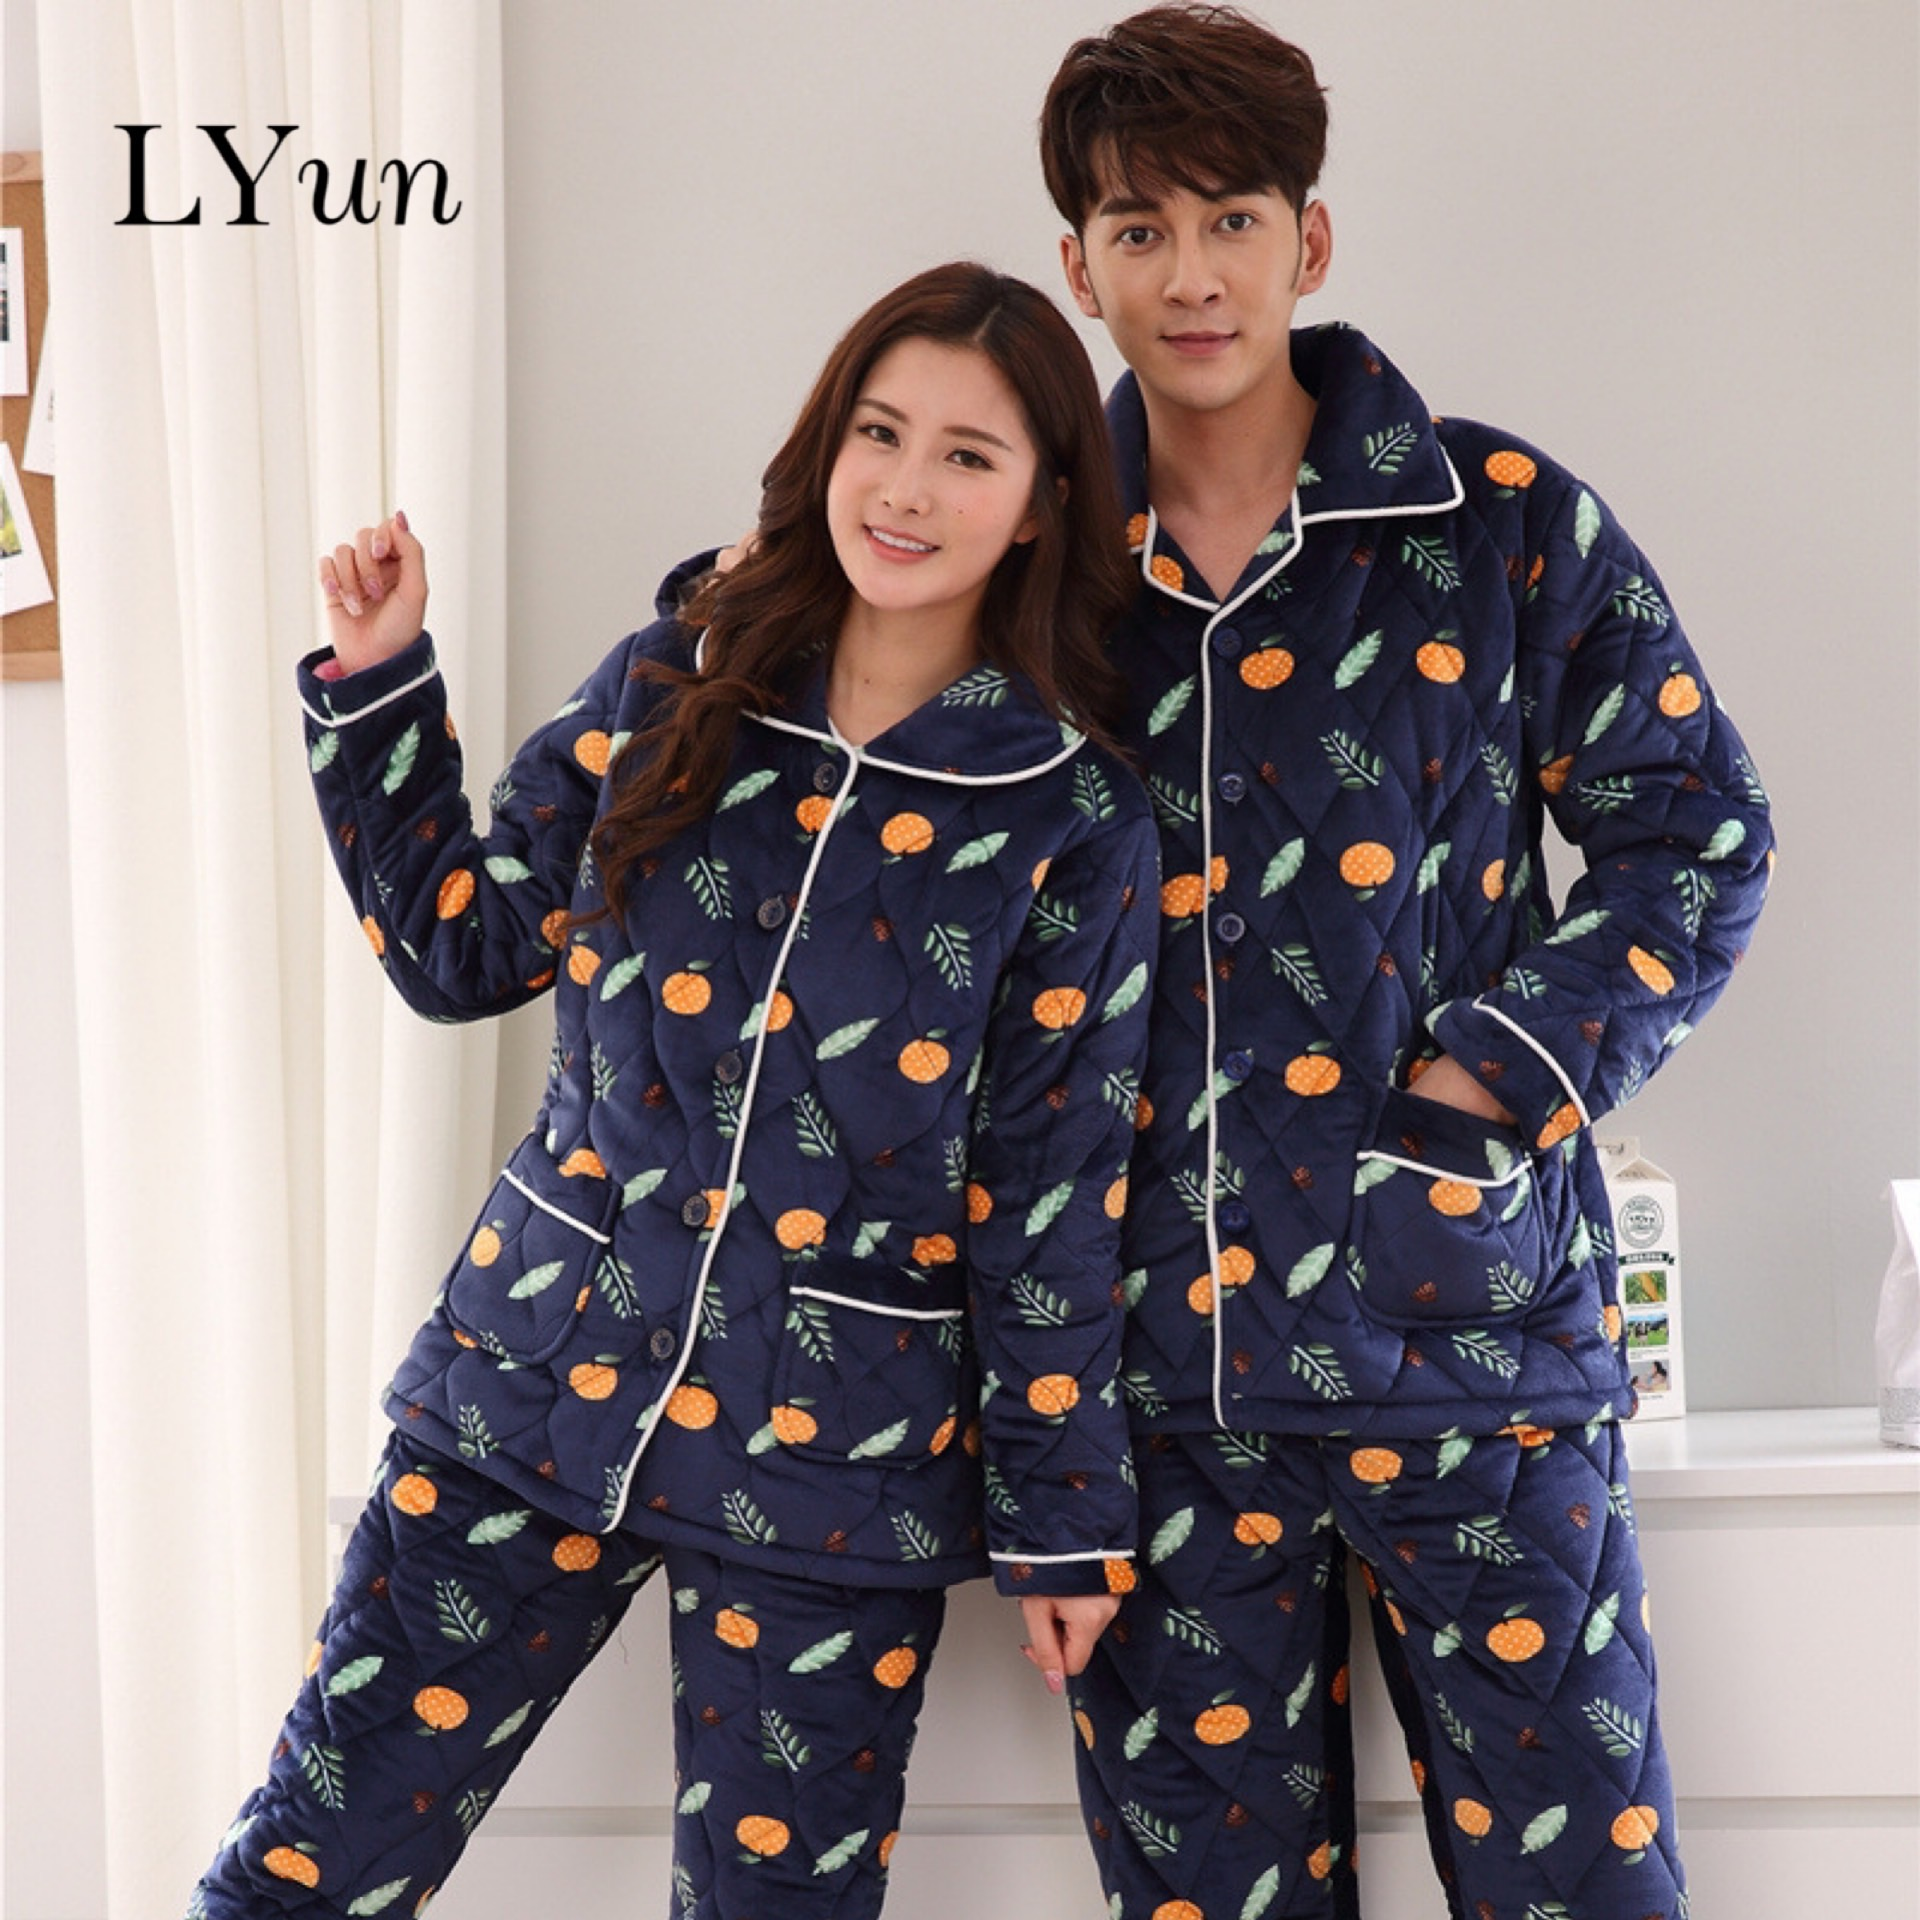 LYun Couple Pajamas Supporting Thick Flannel Pajamas Men's Winter Coral Fleece Lapel Pajamas Women Warm Sleep Suit Color2019new